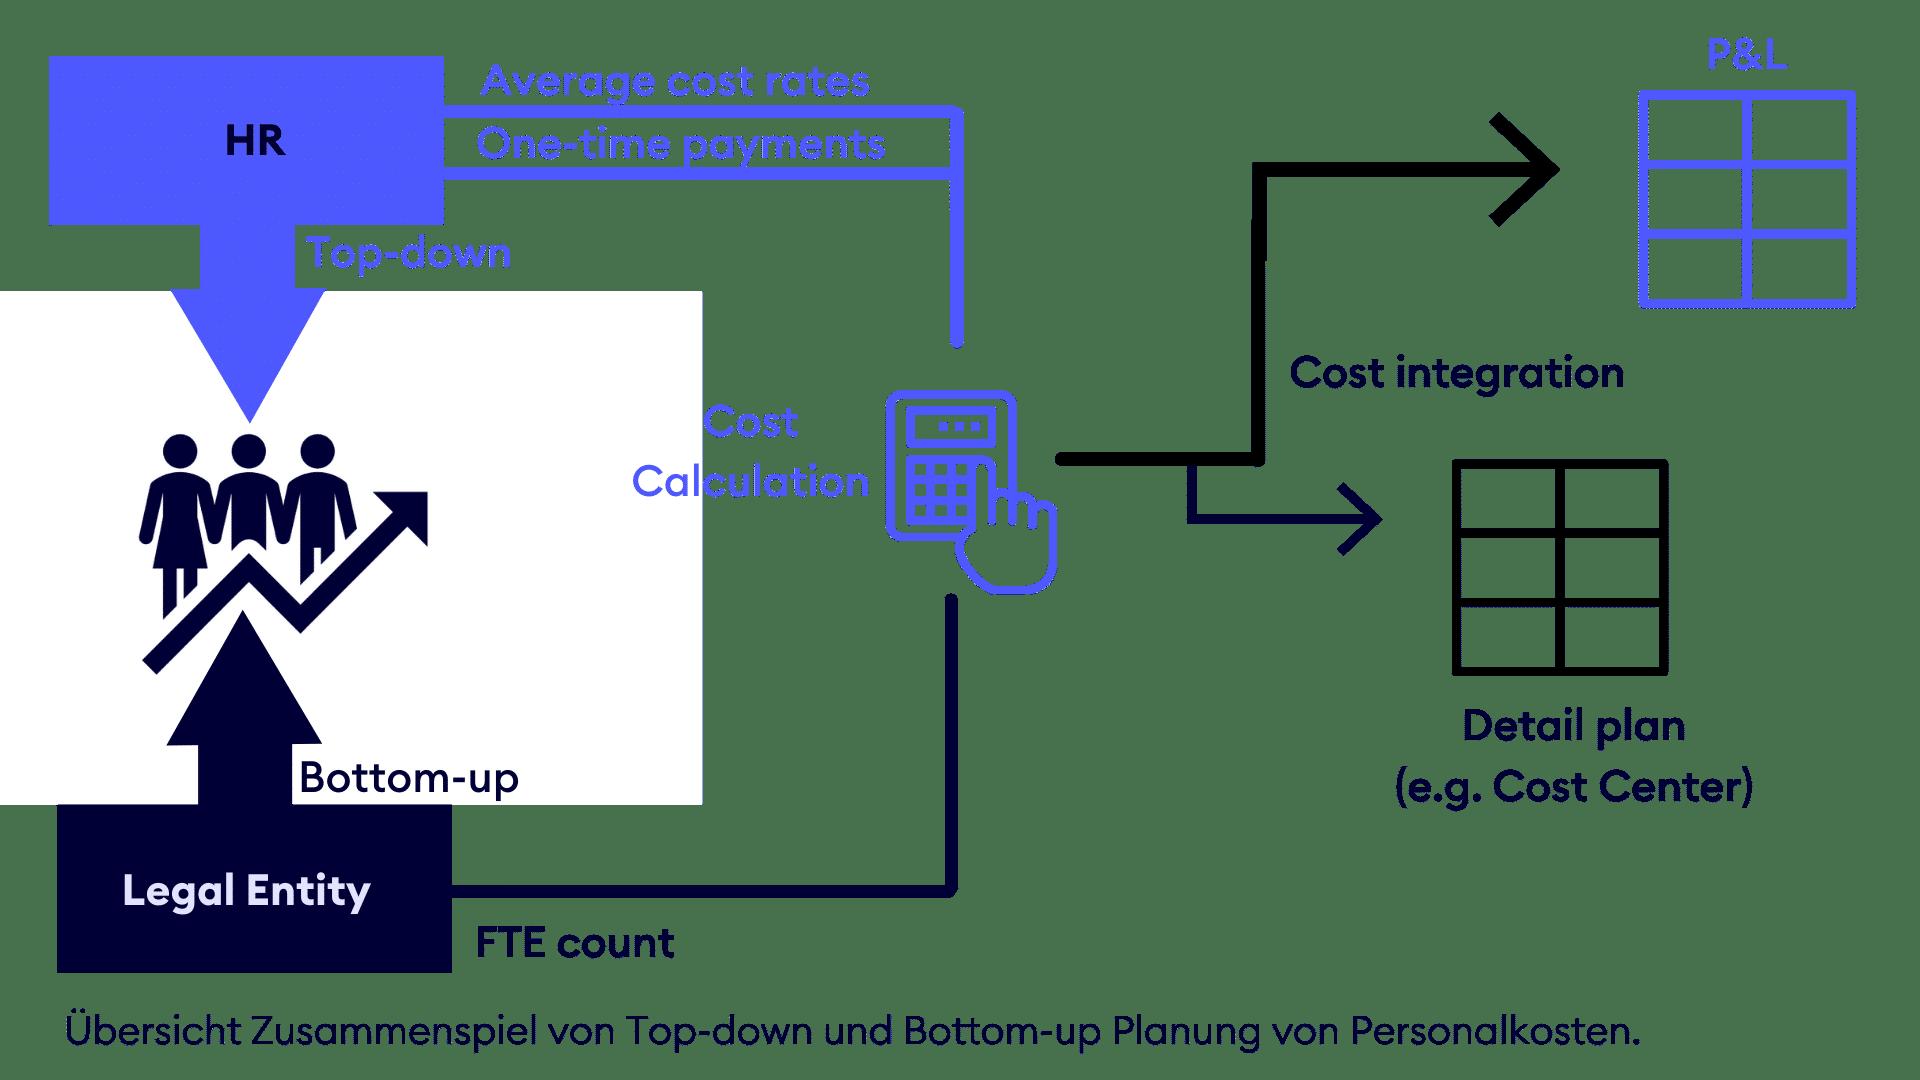 Top-down und Bottom-up Planung CCH Tagetik